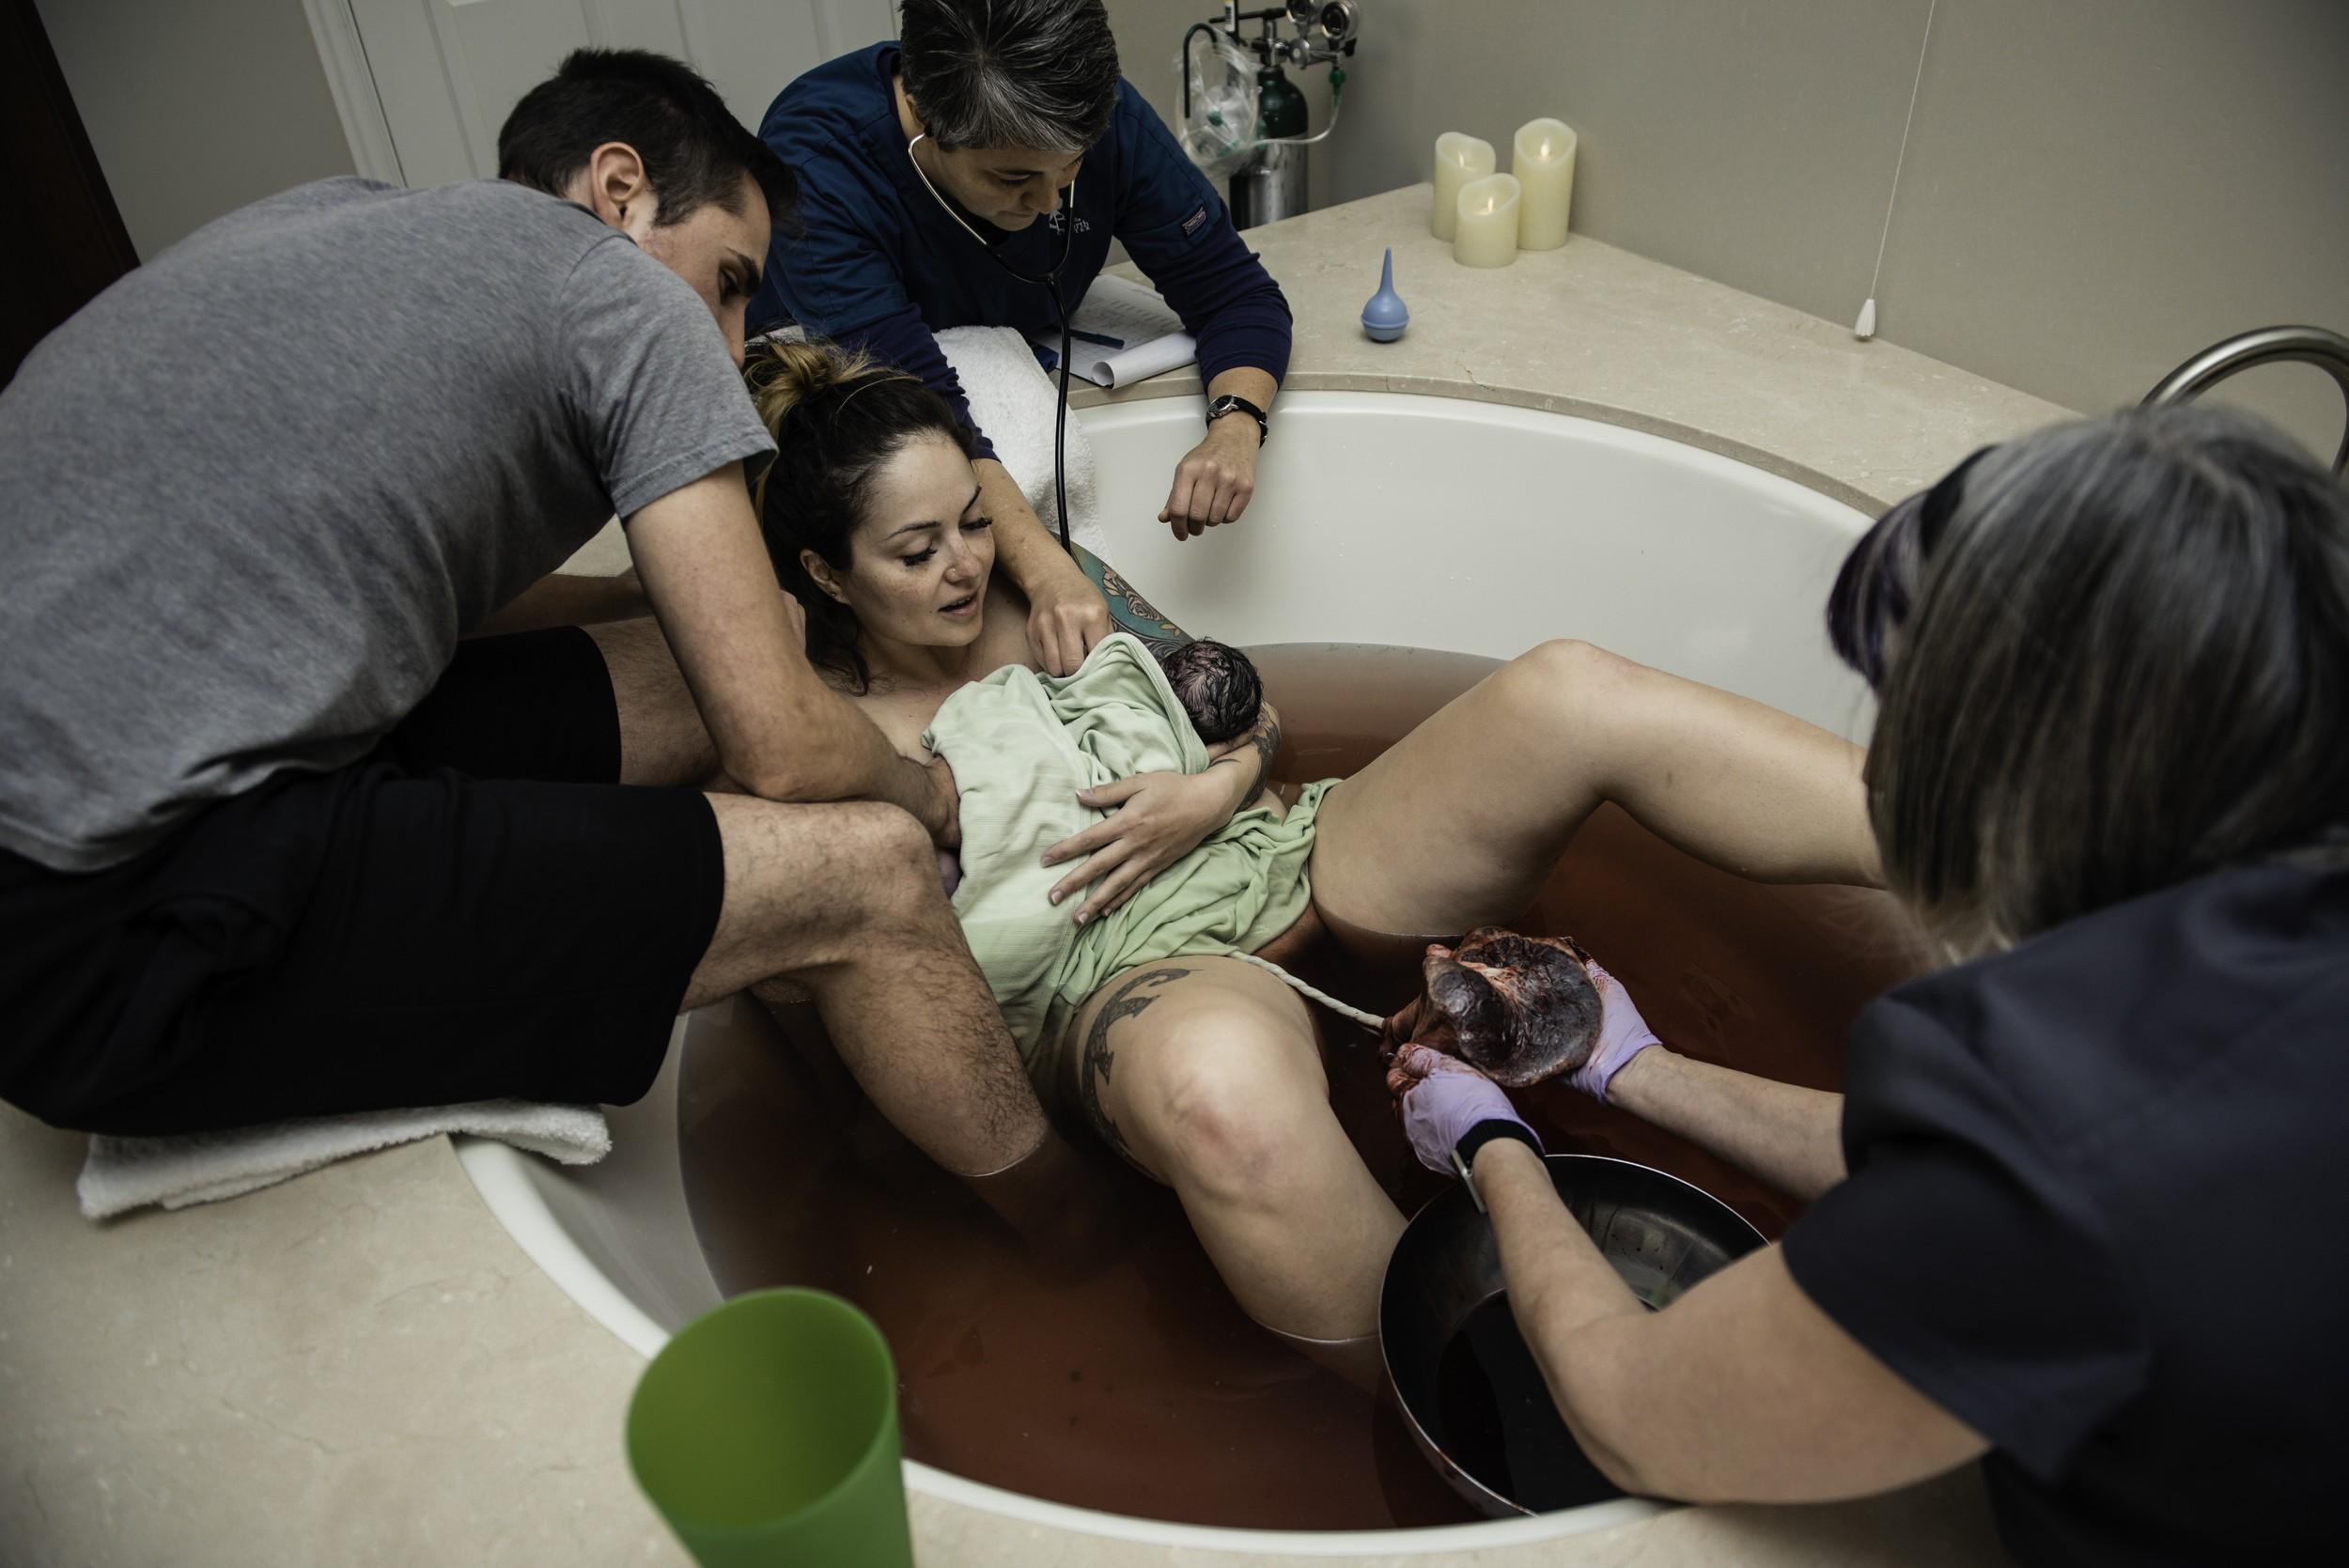 A-waterbirth-story-at-the-birth-center-in-Murray-utah-salt-lake-city-birth-photographer-birth-videography,-natural-birth,-homebirth-52.jpg